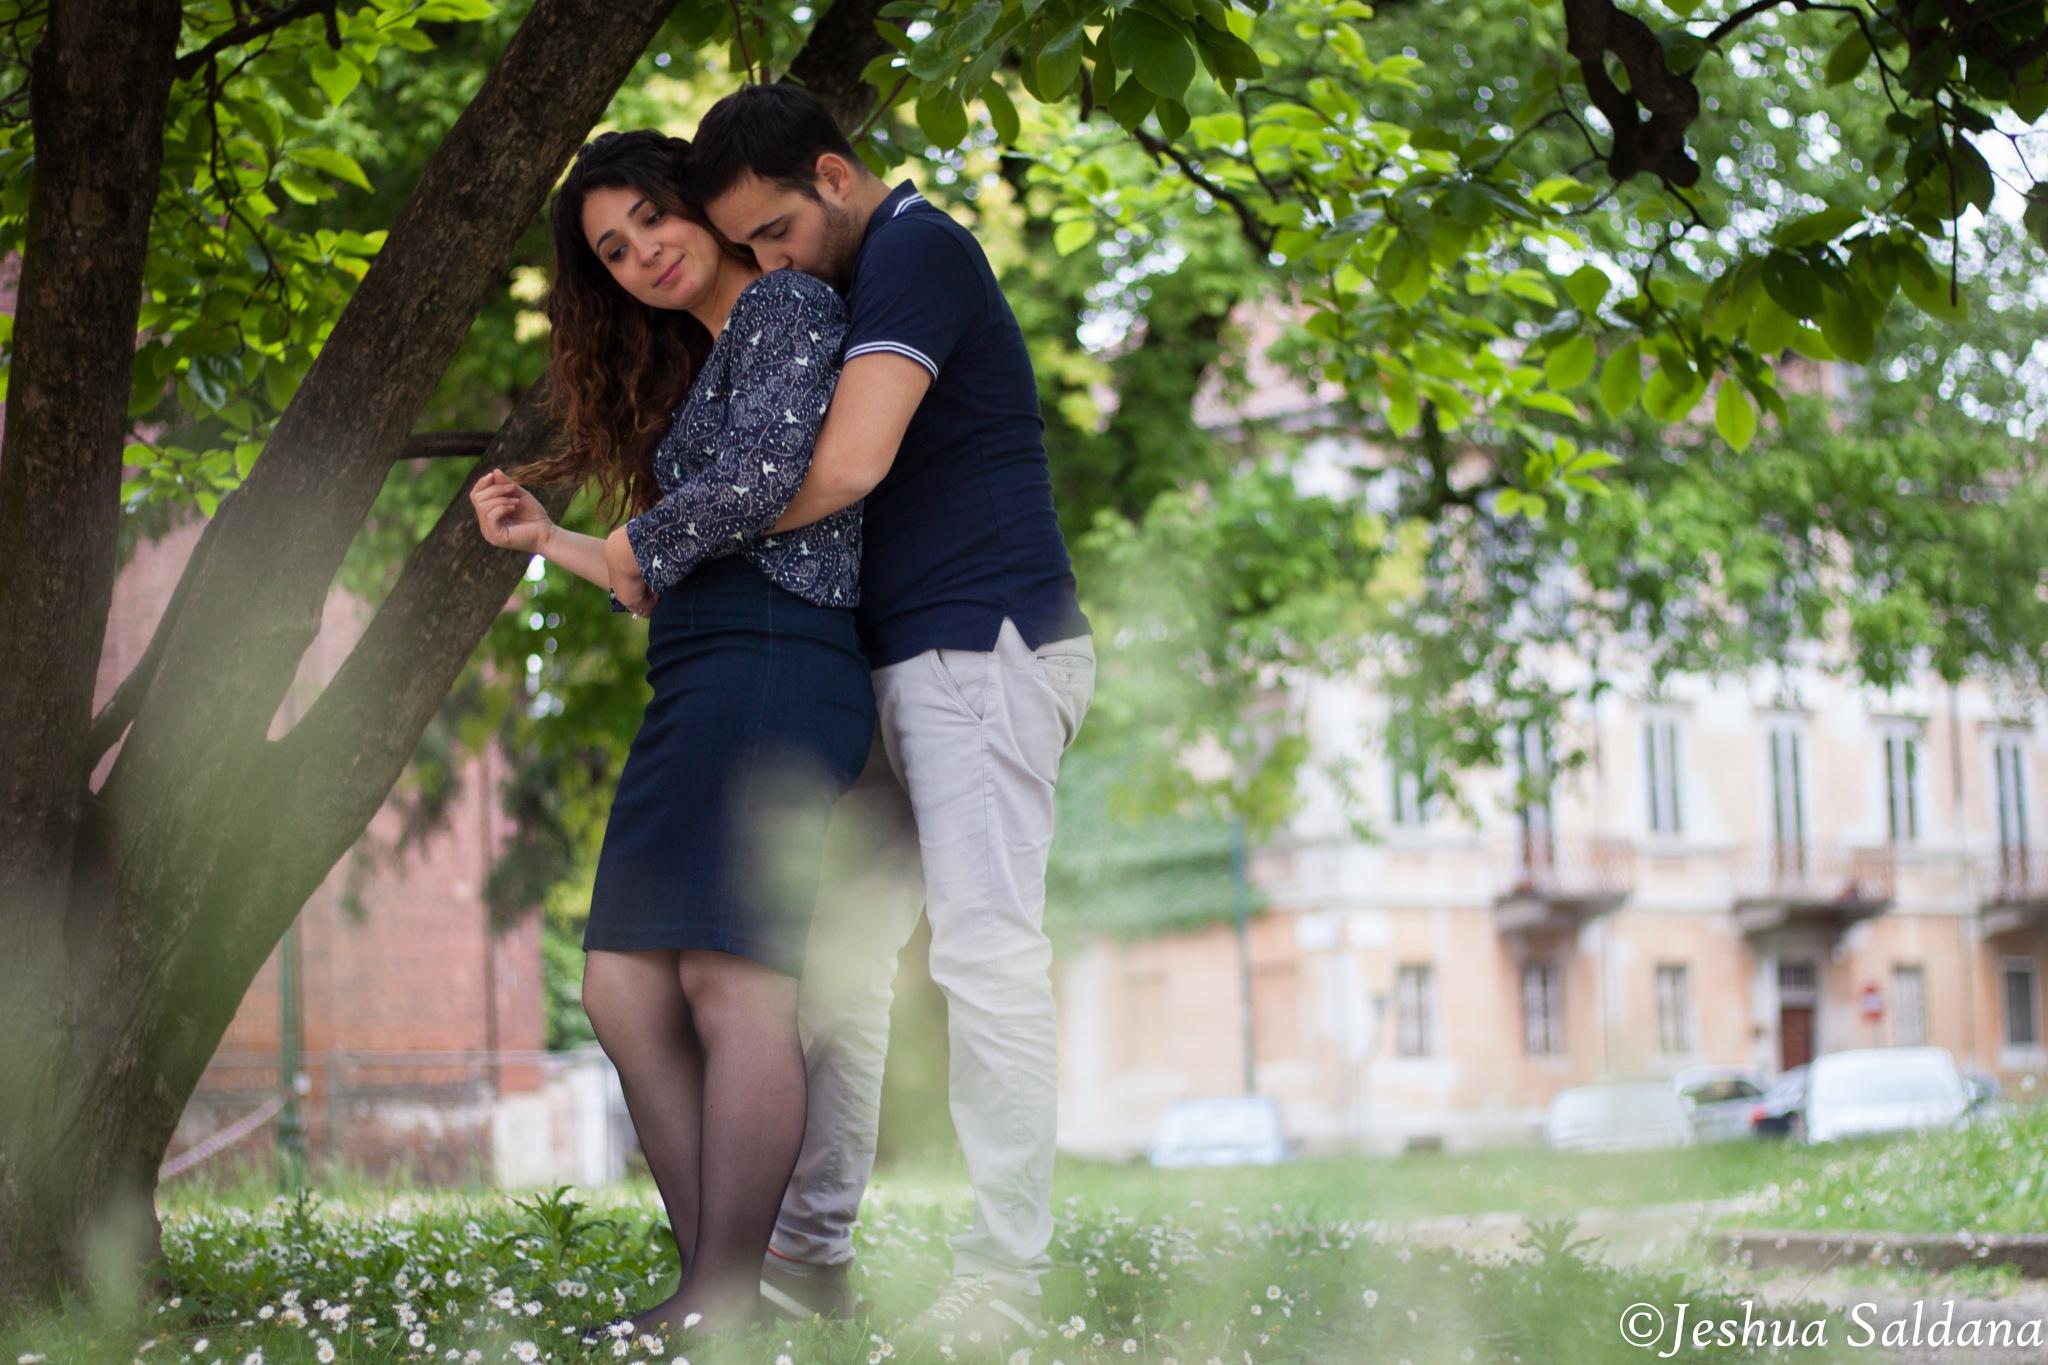 Love is in the air by Jeshua Saldana